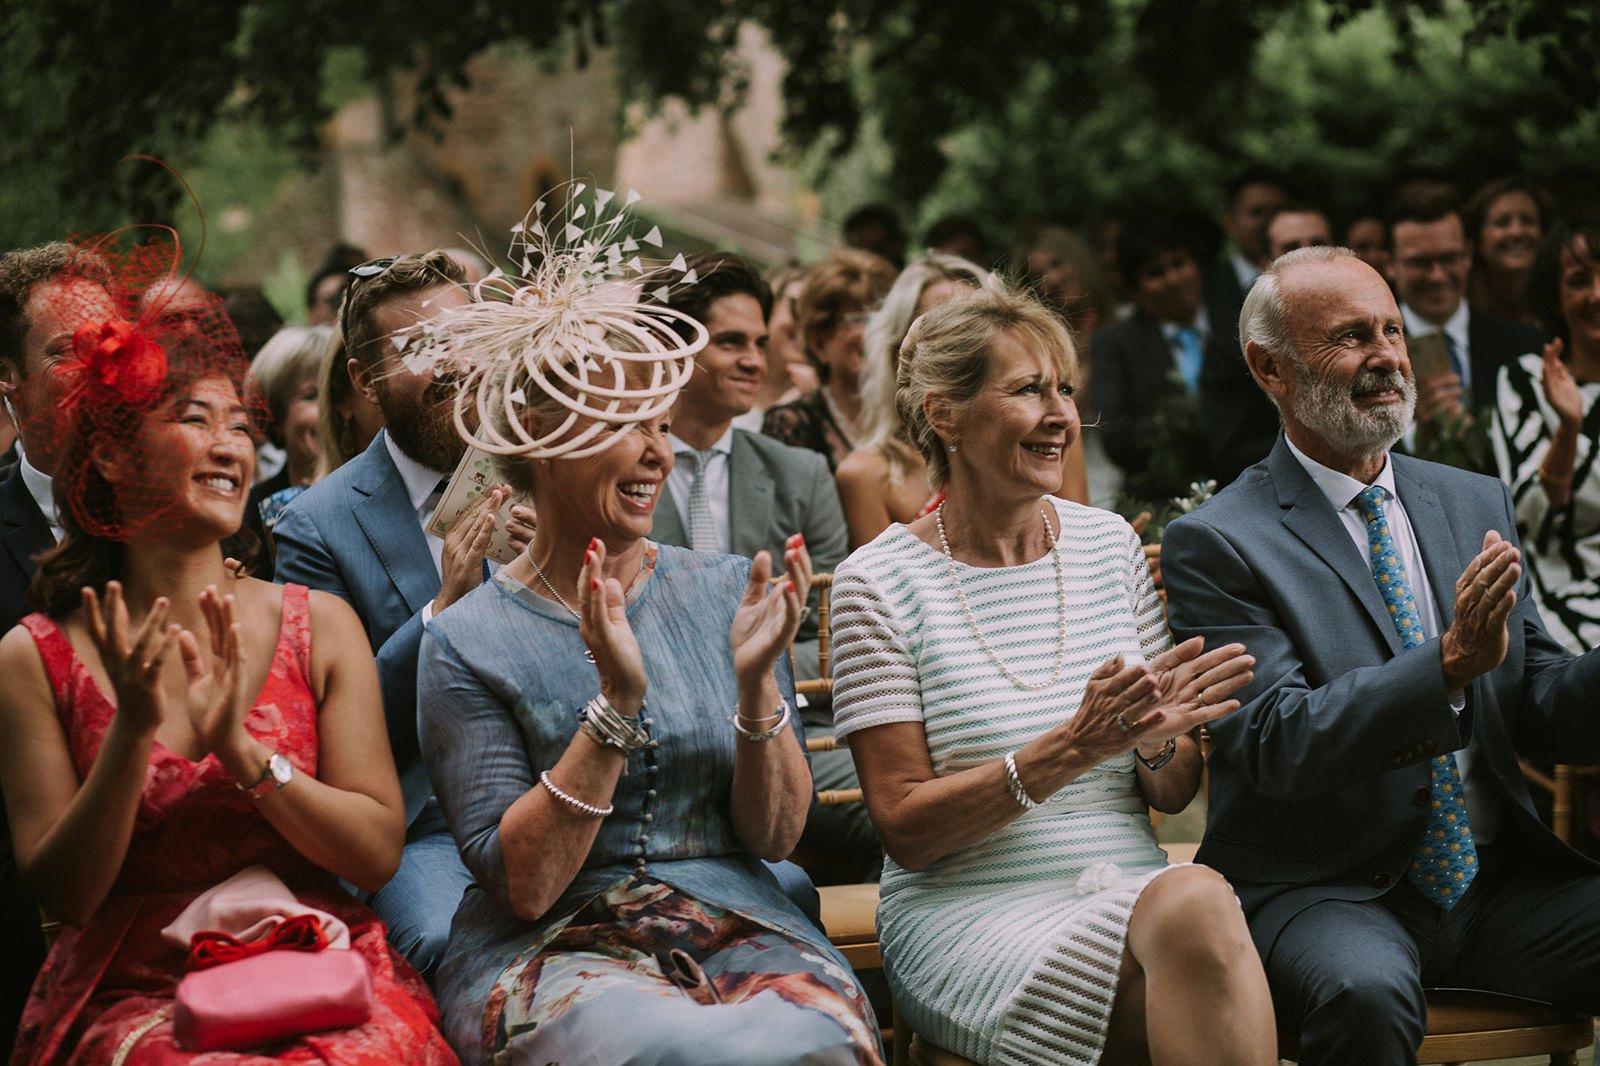 maunsel house natural wedding